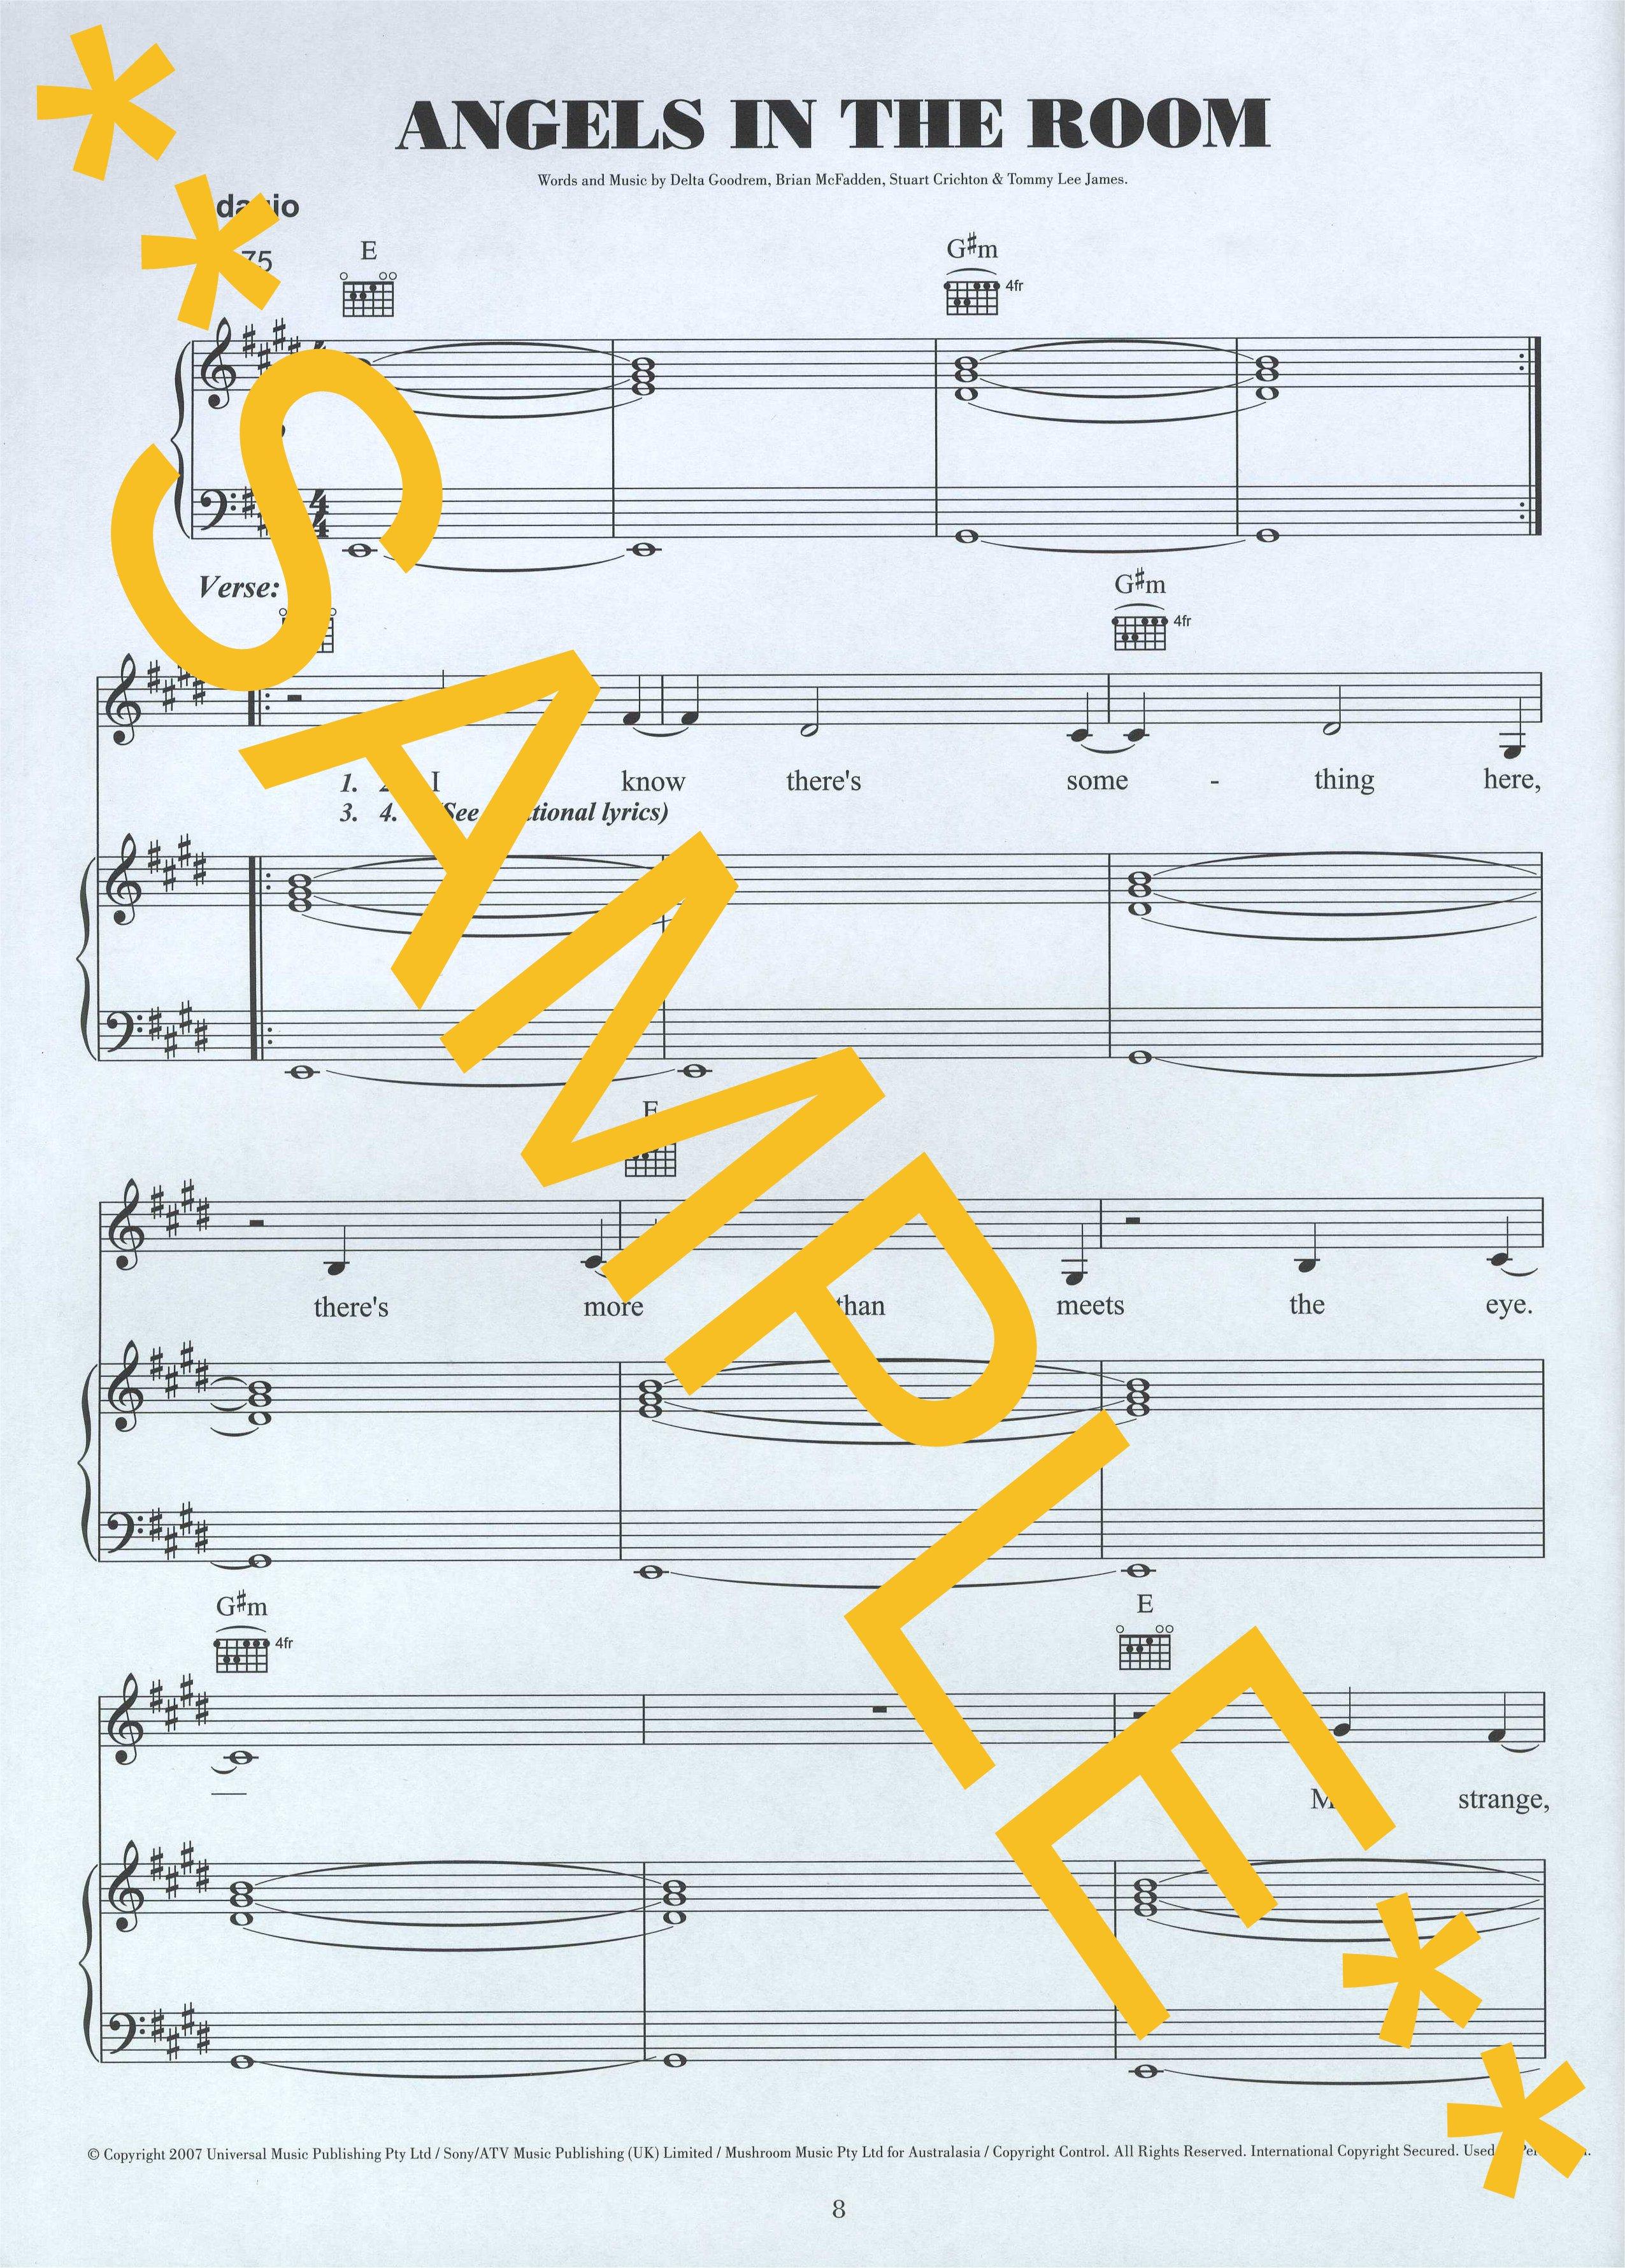 Musik Schiller Zwickau Seit 1953 Ihr Musikgesch 228 Ft F 252 R